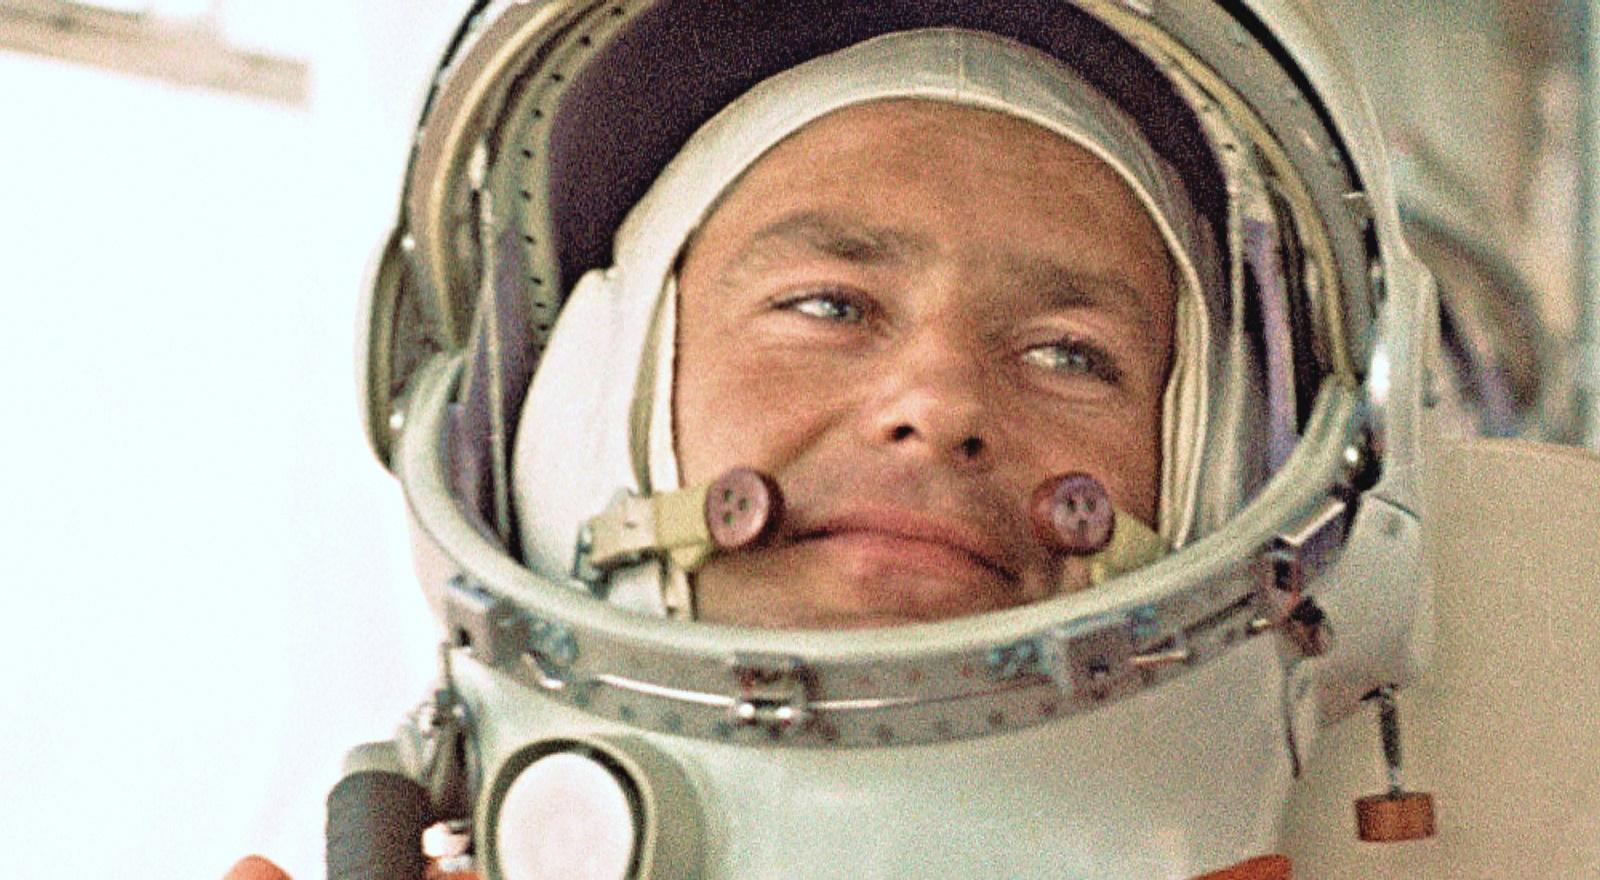 00-german-titov-02-russian-cosmonaut-060816.jpg